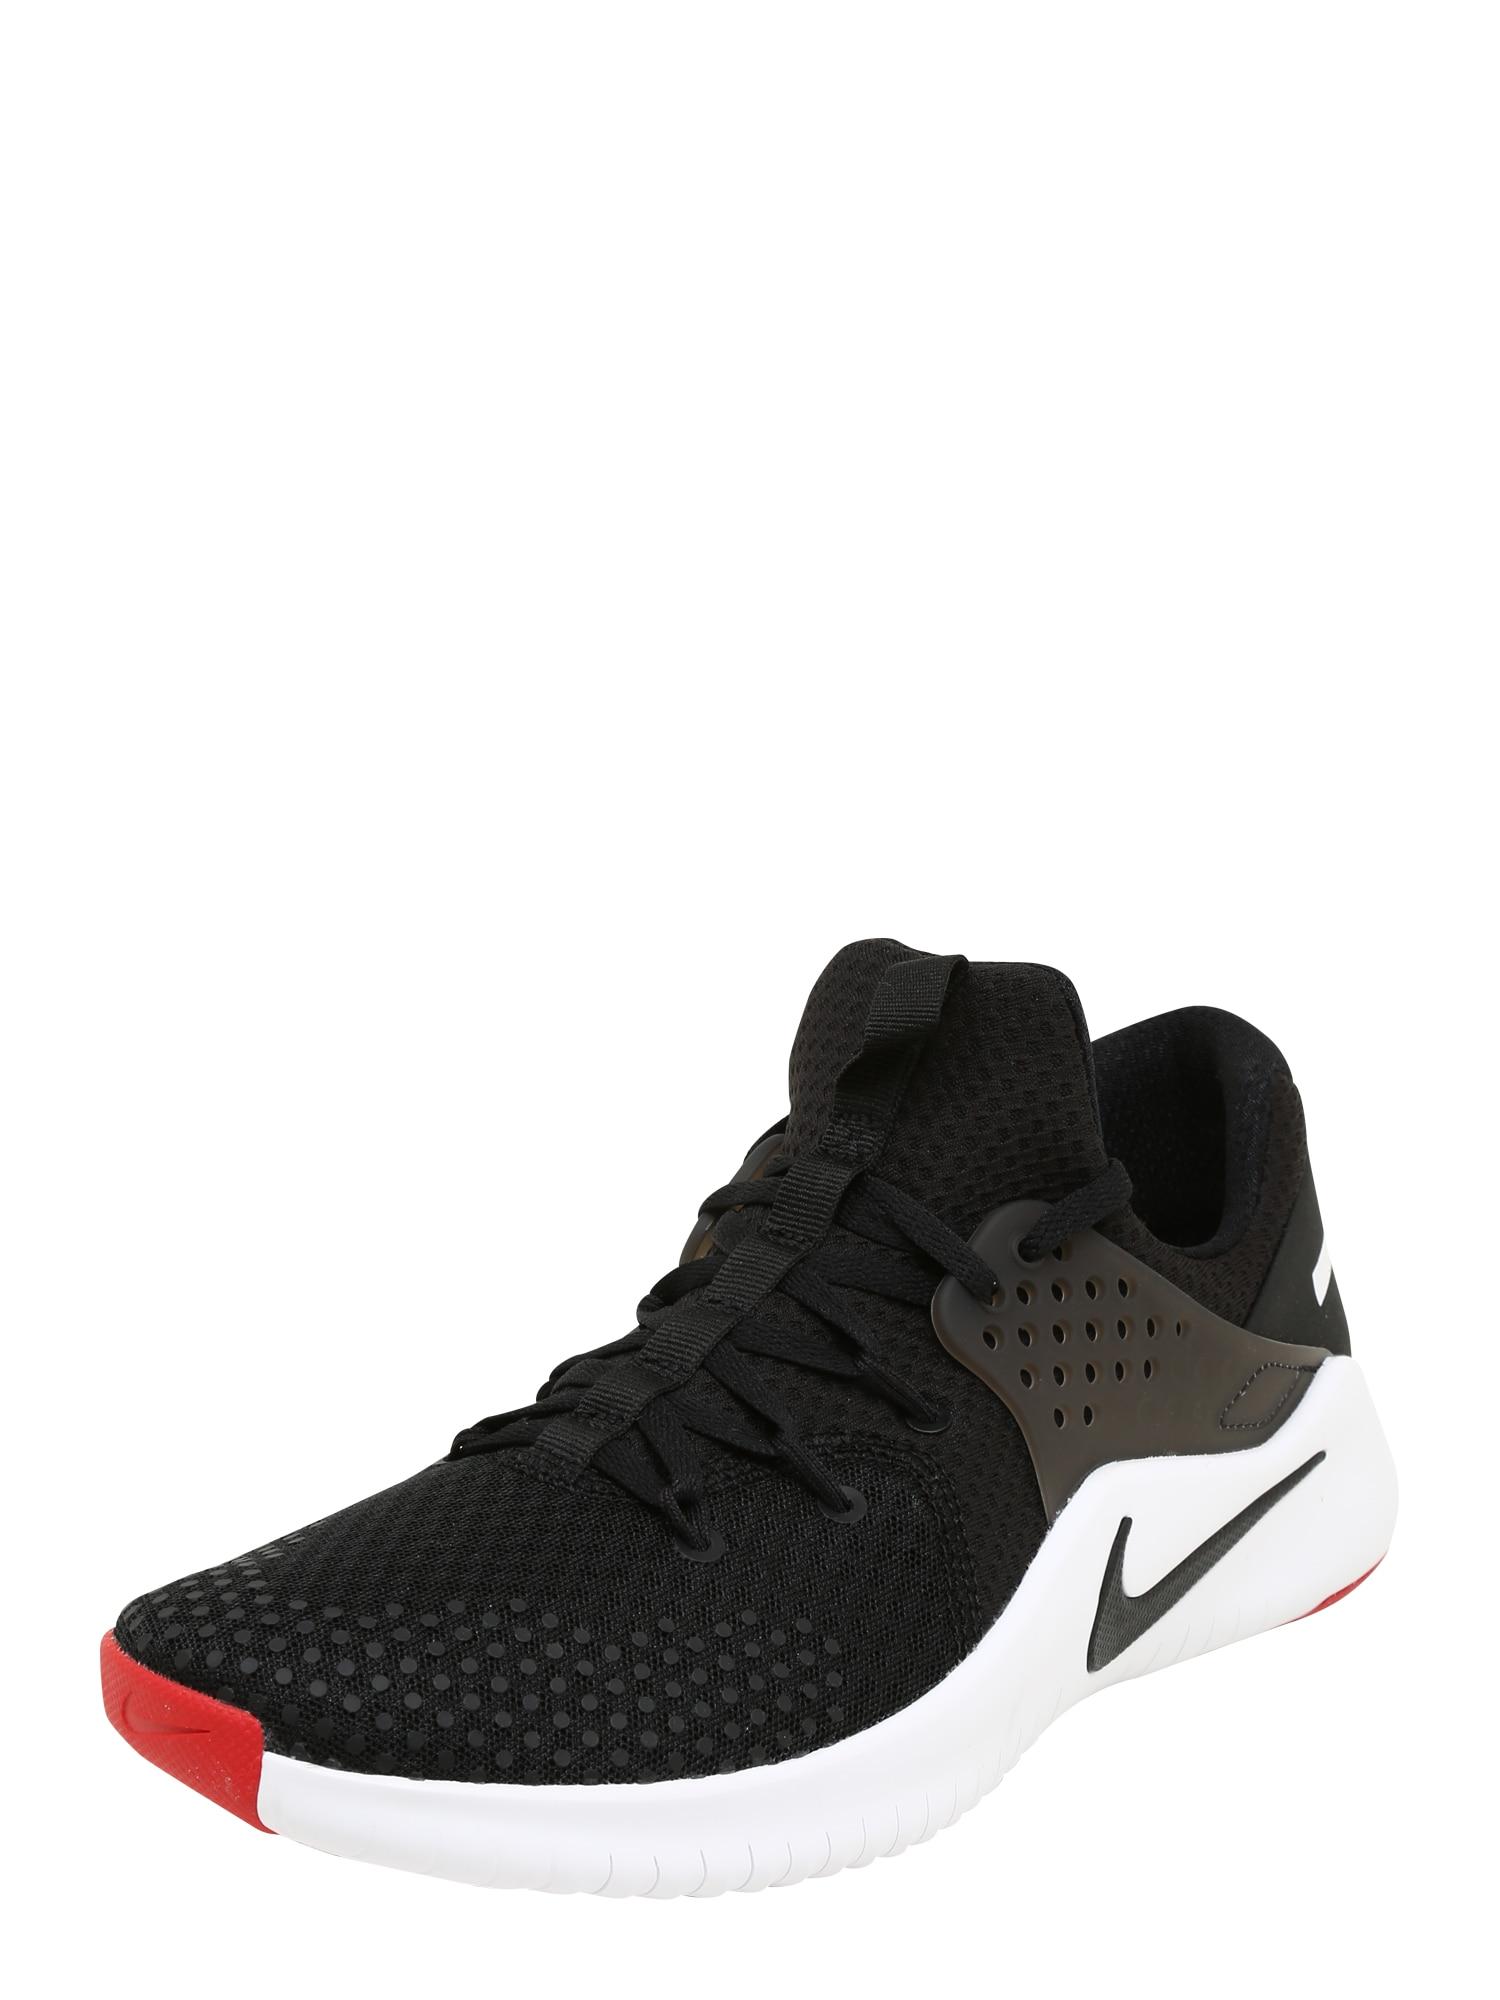 NIKE, Heren Sportschoen 'Free Trainer V8', rood / zwart / wit